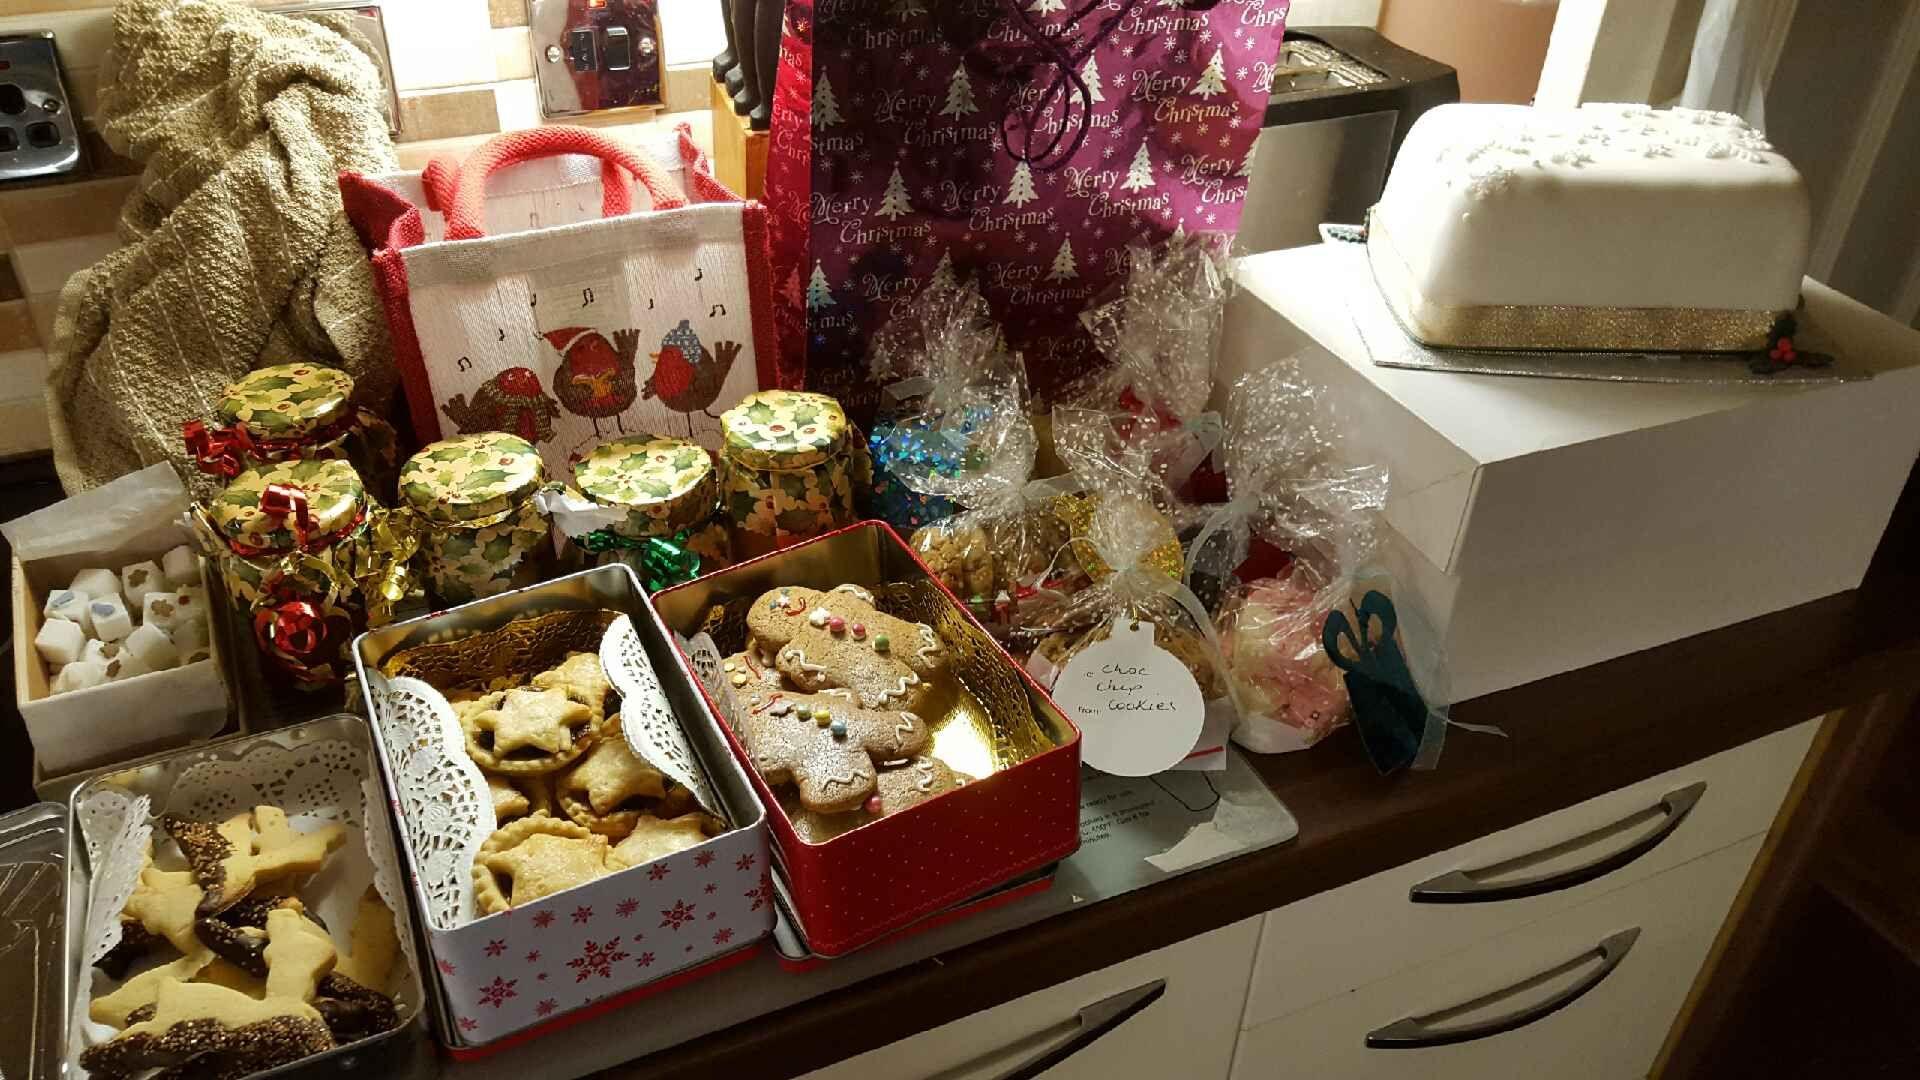 2015 Christmas hamper 🎄